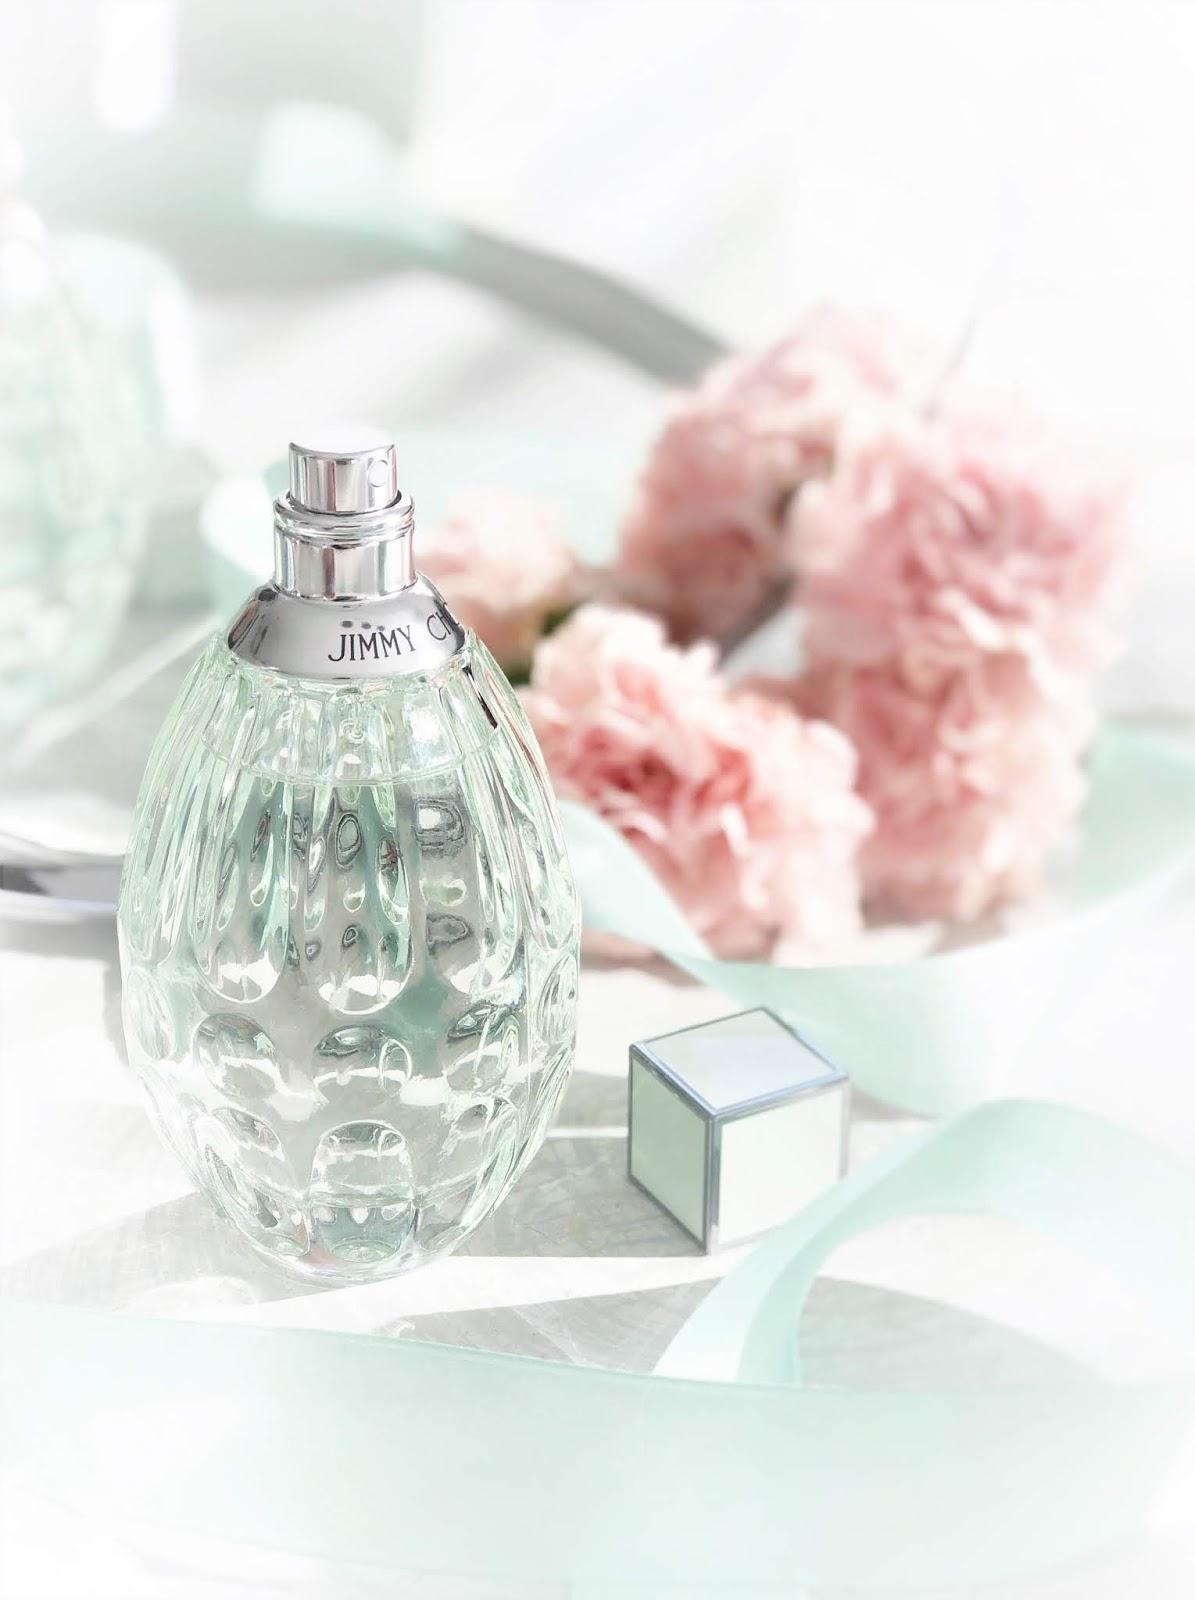 Perfumy na wiosnę - Jimmy Choo Floral